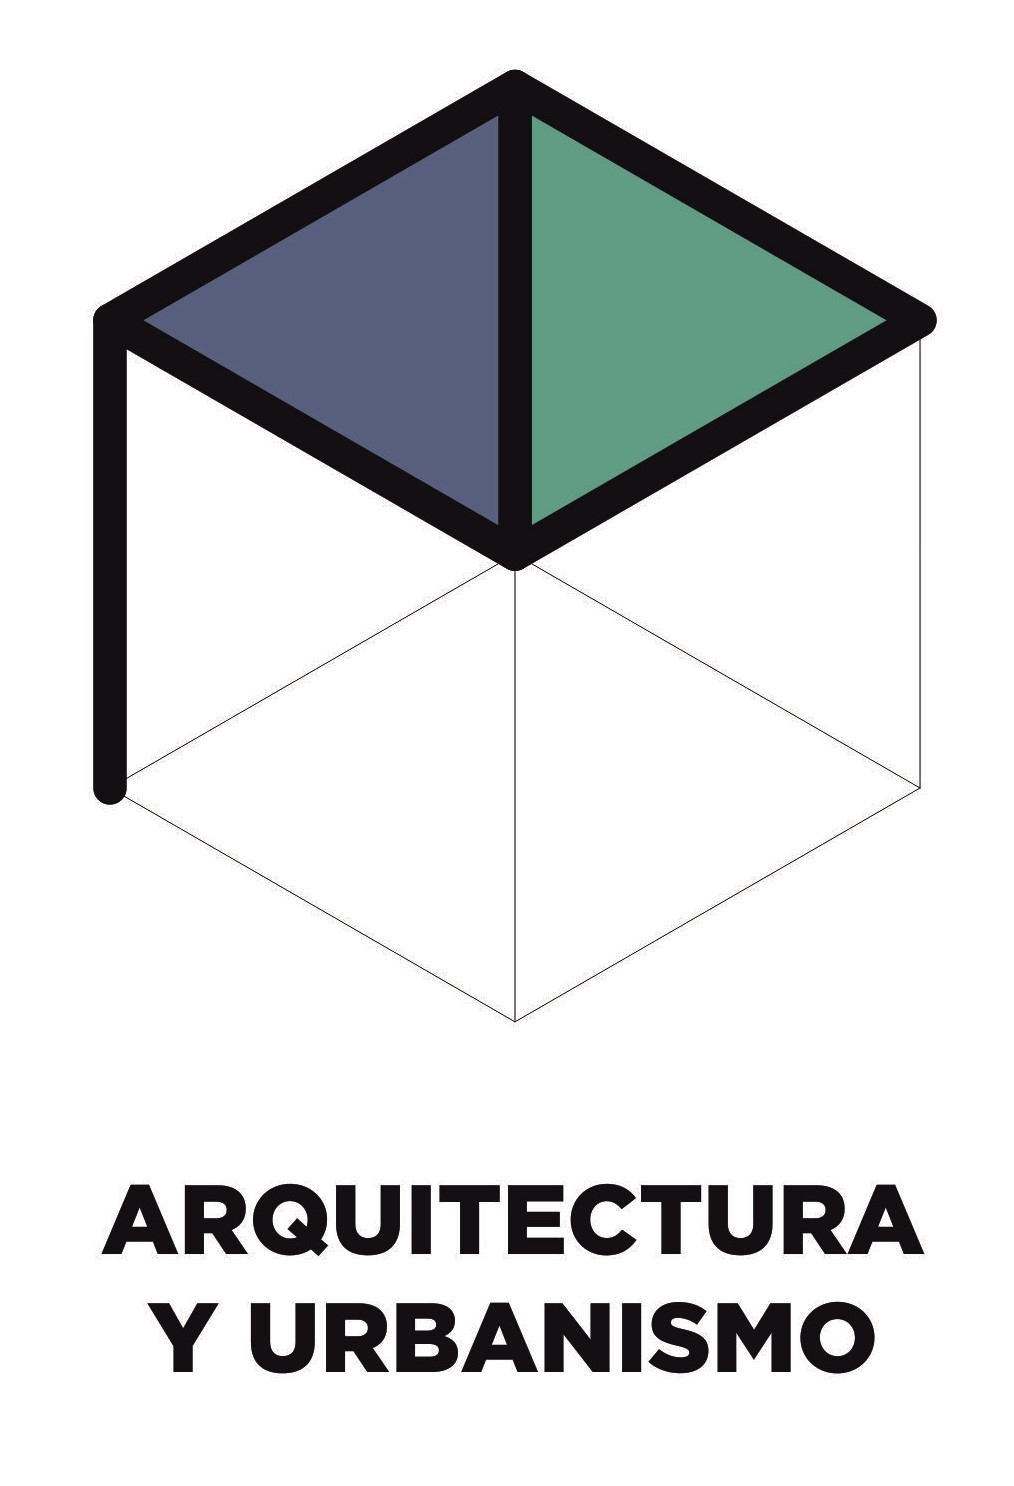 Proyectos De Pdlp Arquitectura Y Urbanismo Profesional De